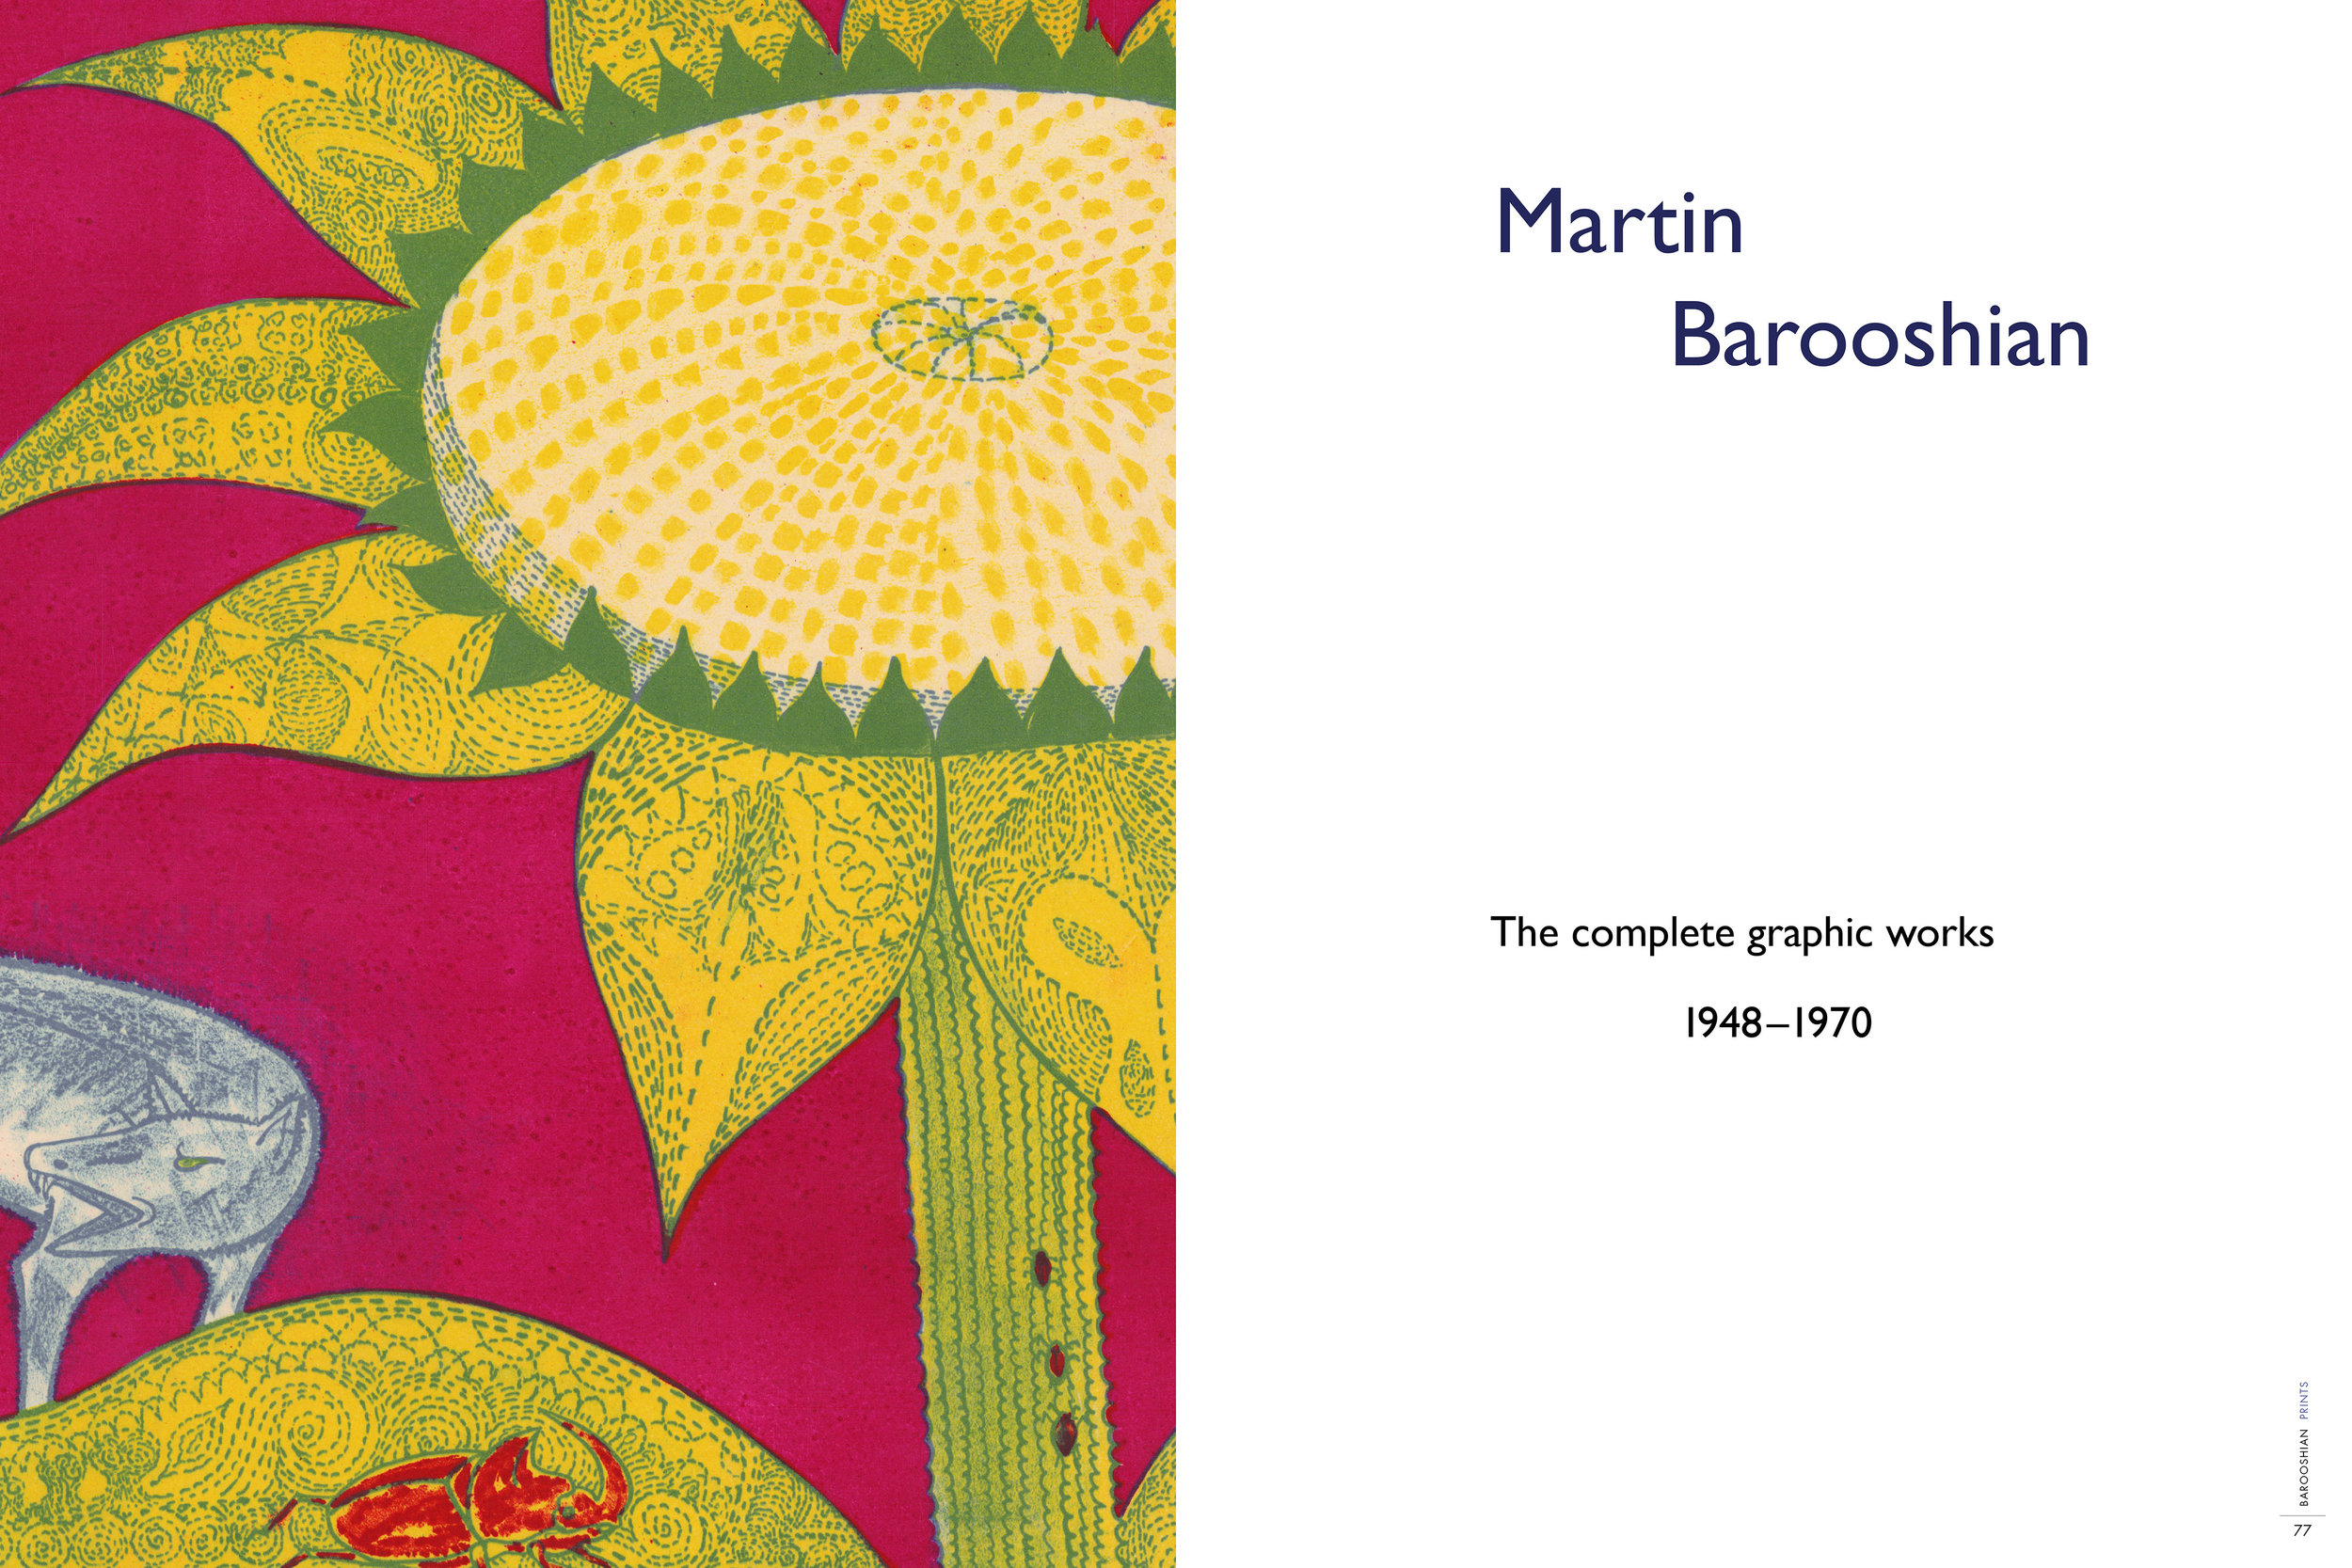 Barooshian_book-tbd-pp76-77lrgmed.jpg